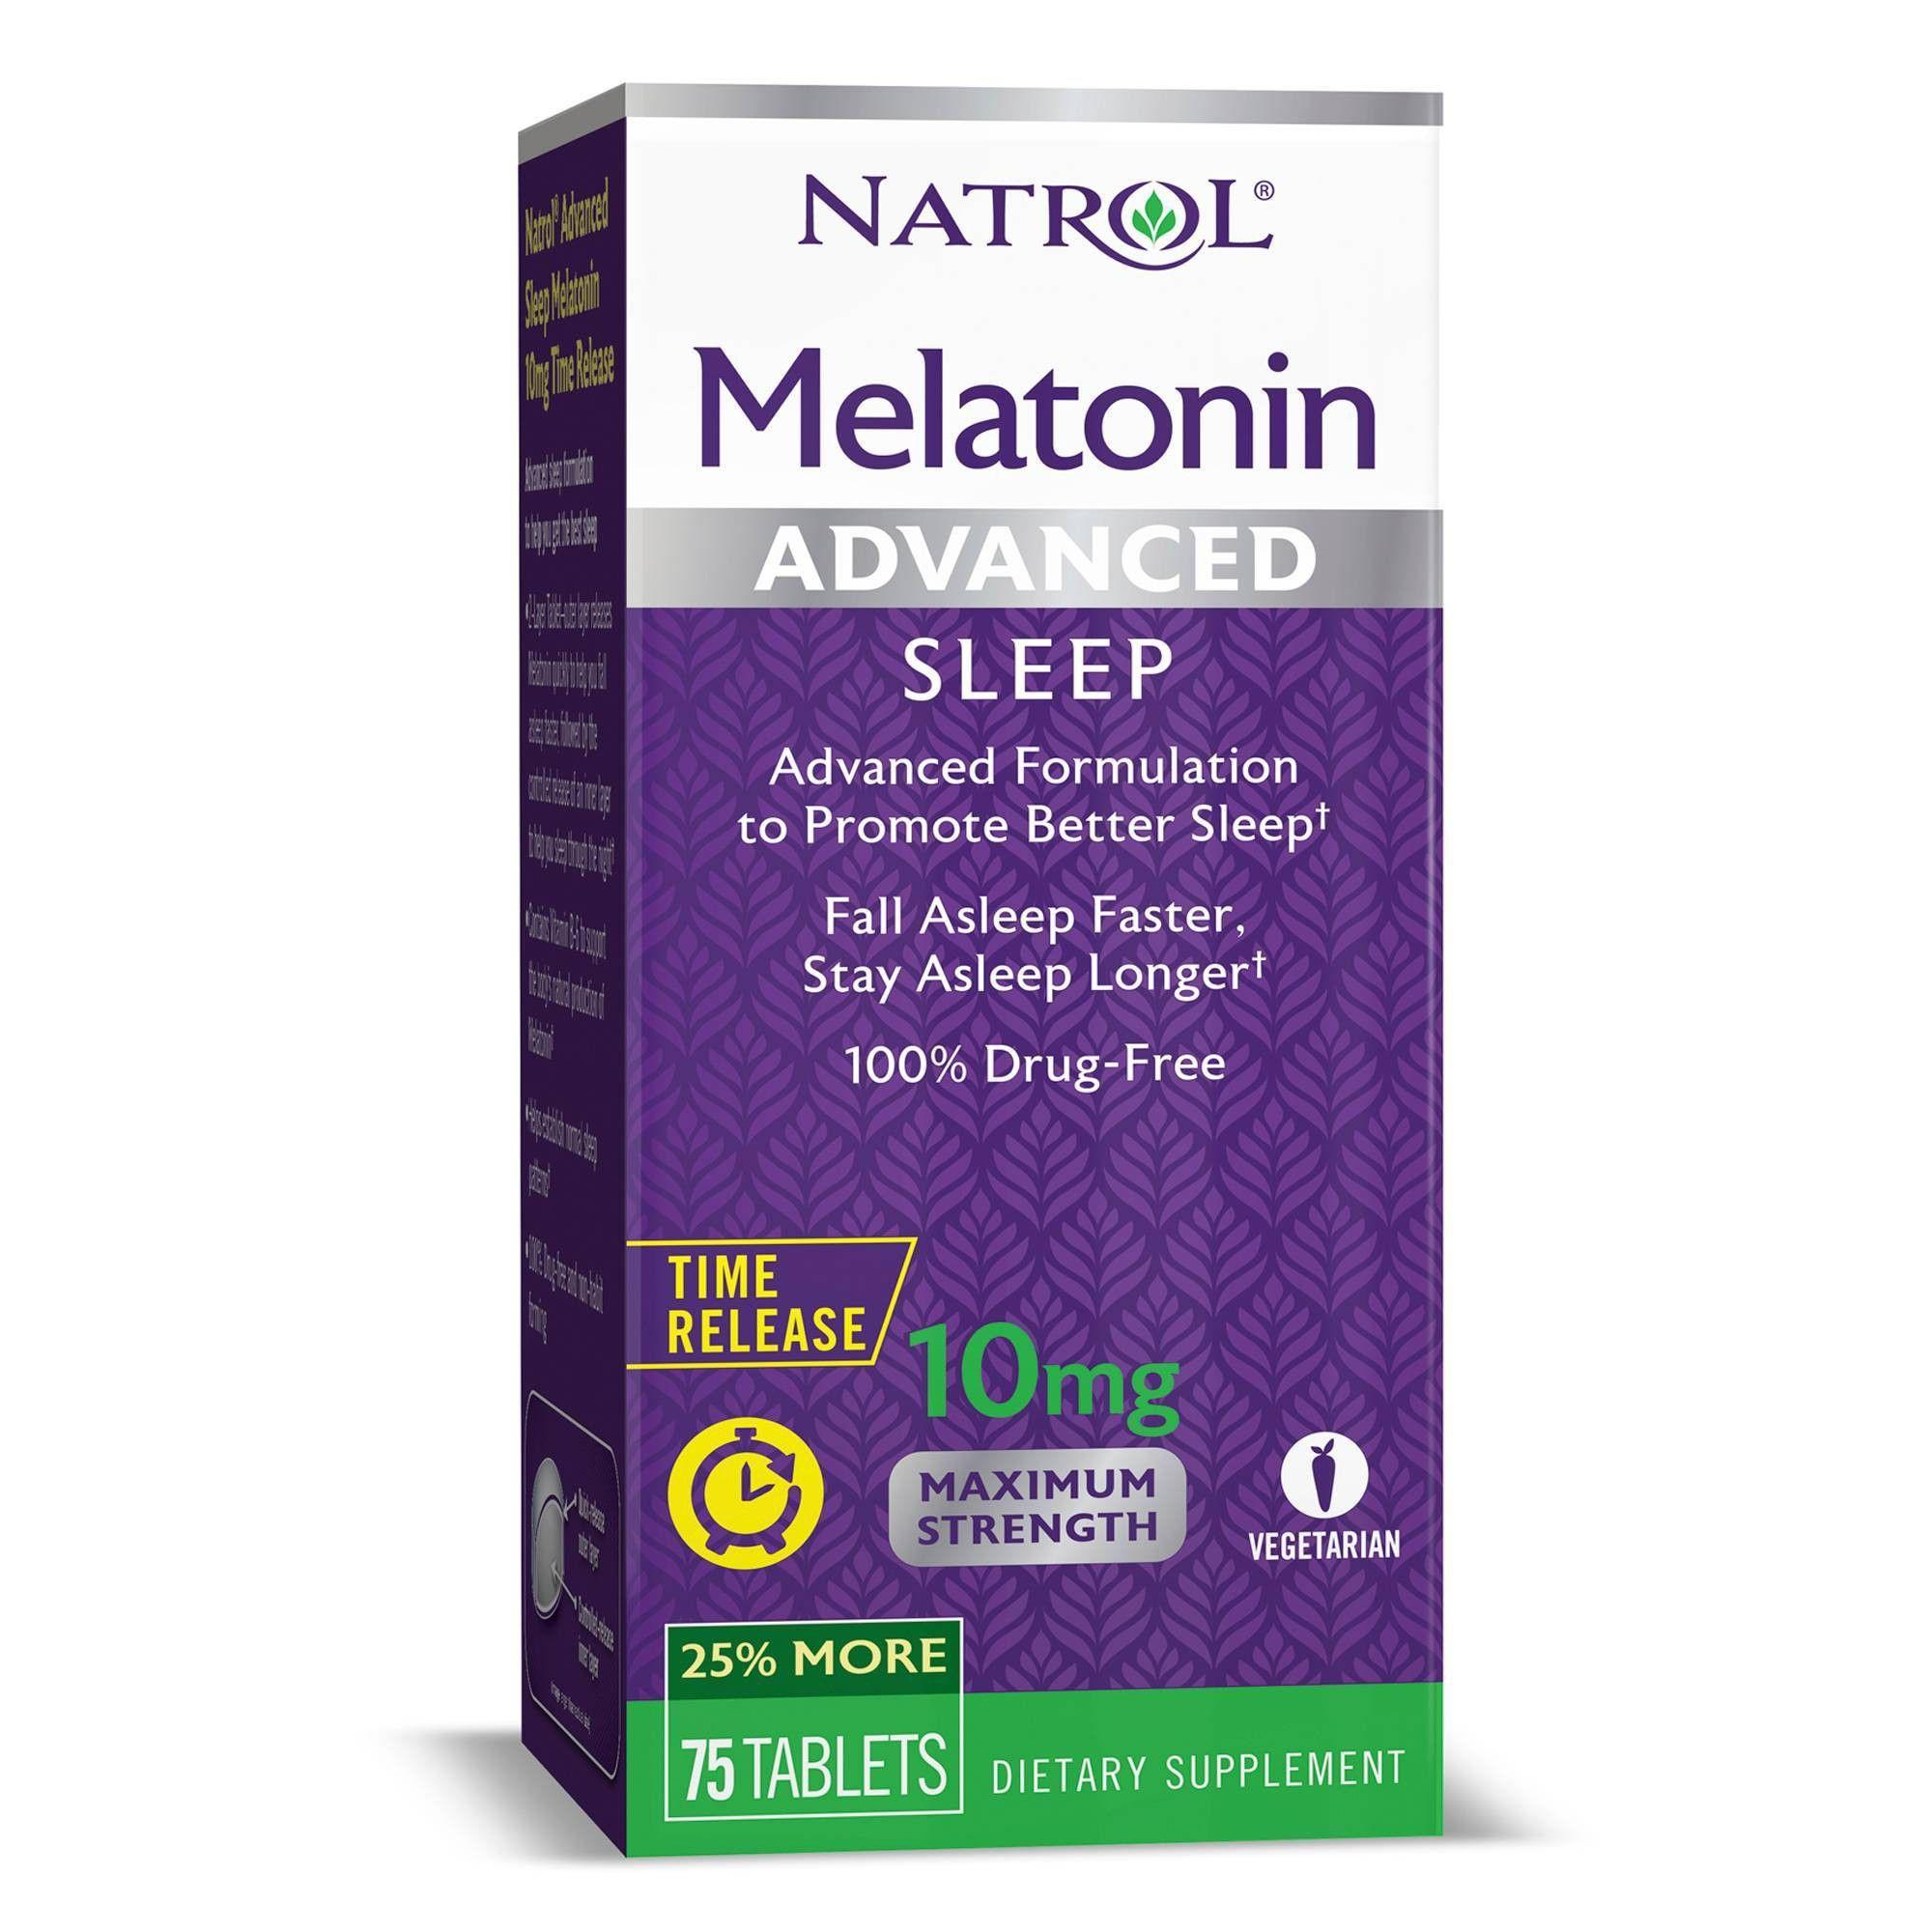 Natrol Melatonin Advanced Sleep Aid 10mg Supplement Tablets